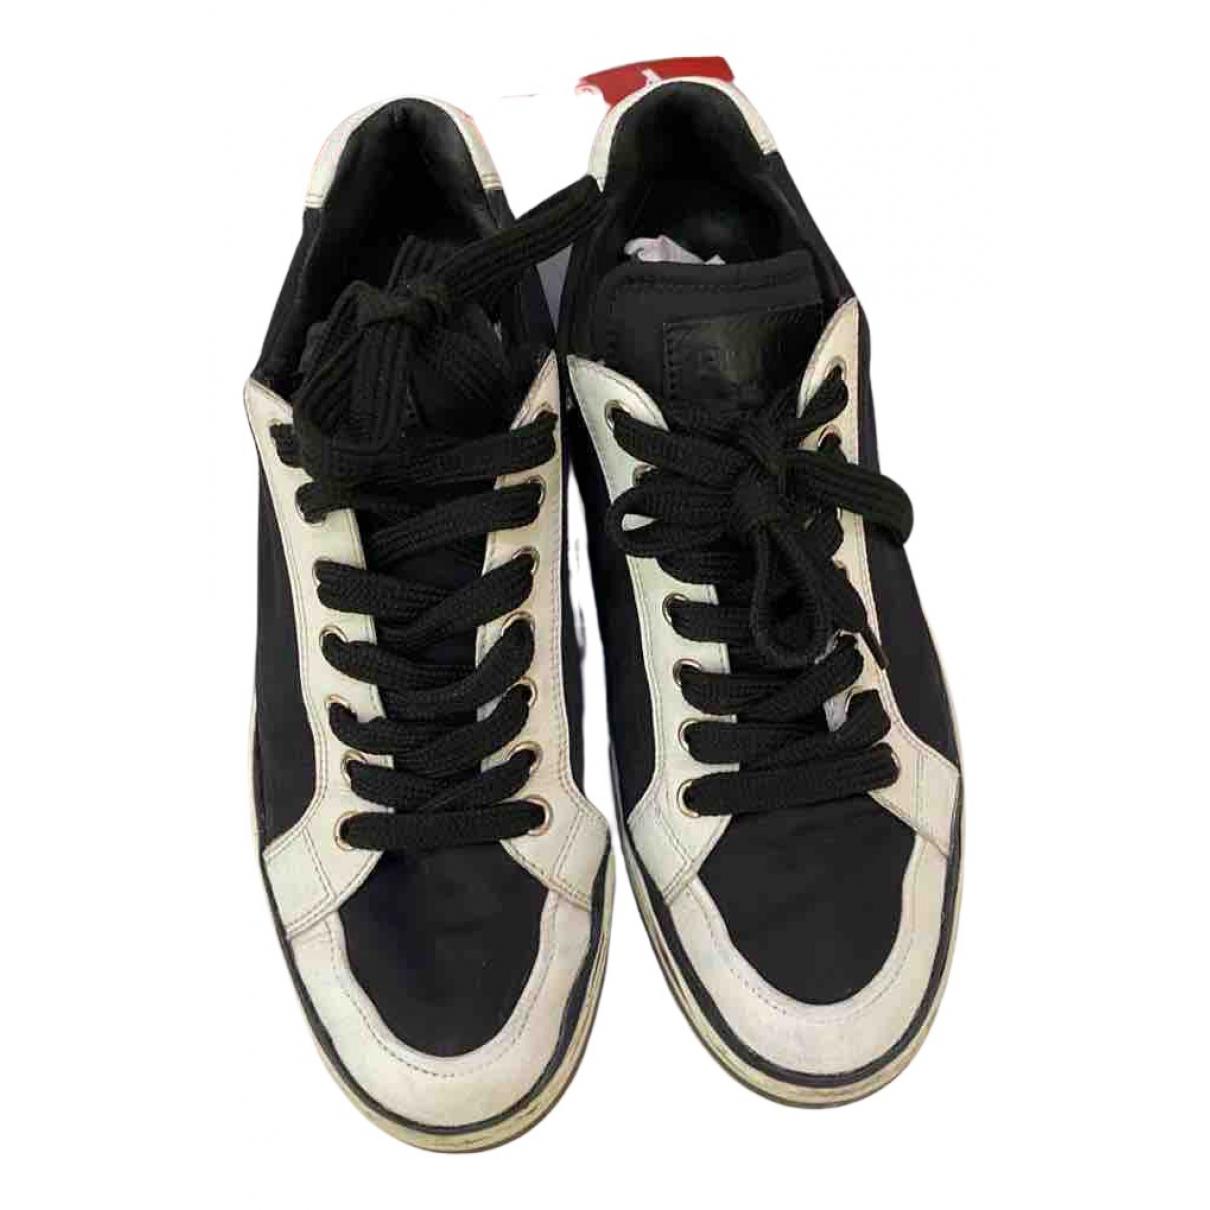 Prada \N Sneakers in Kautschuk